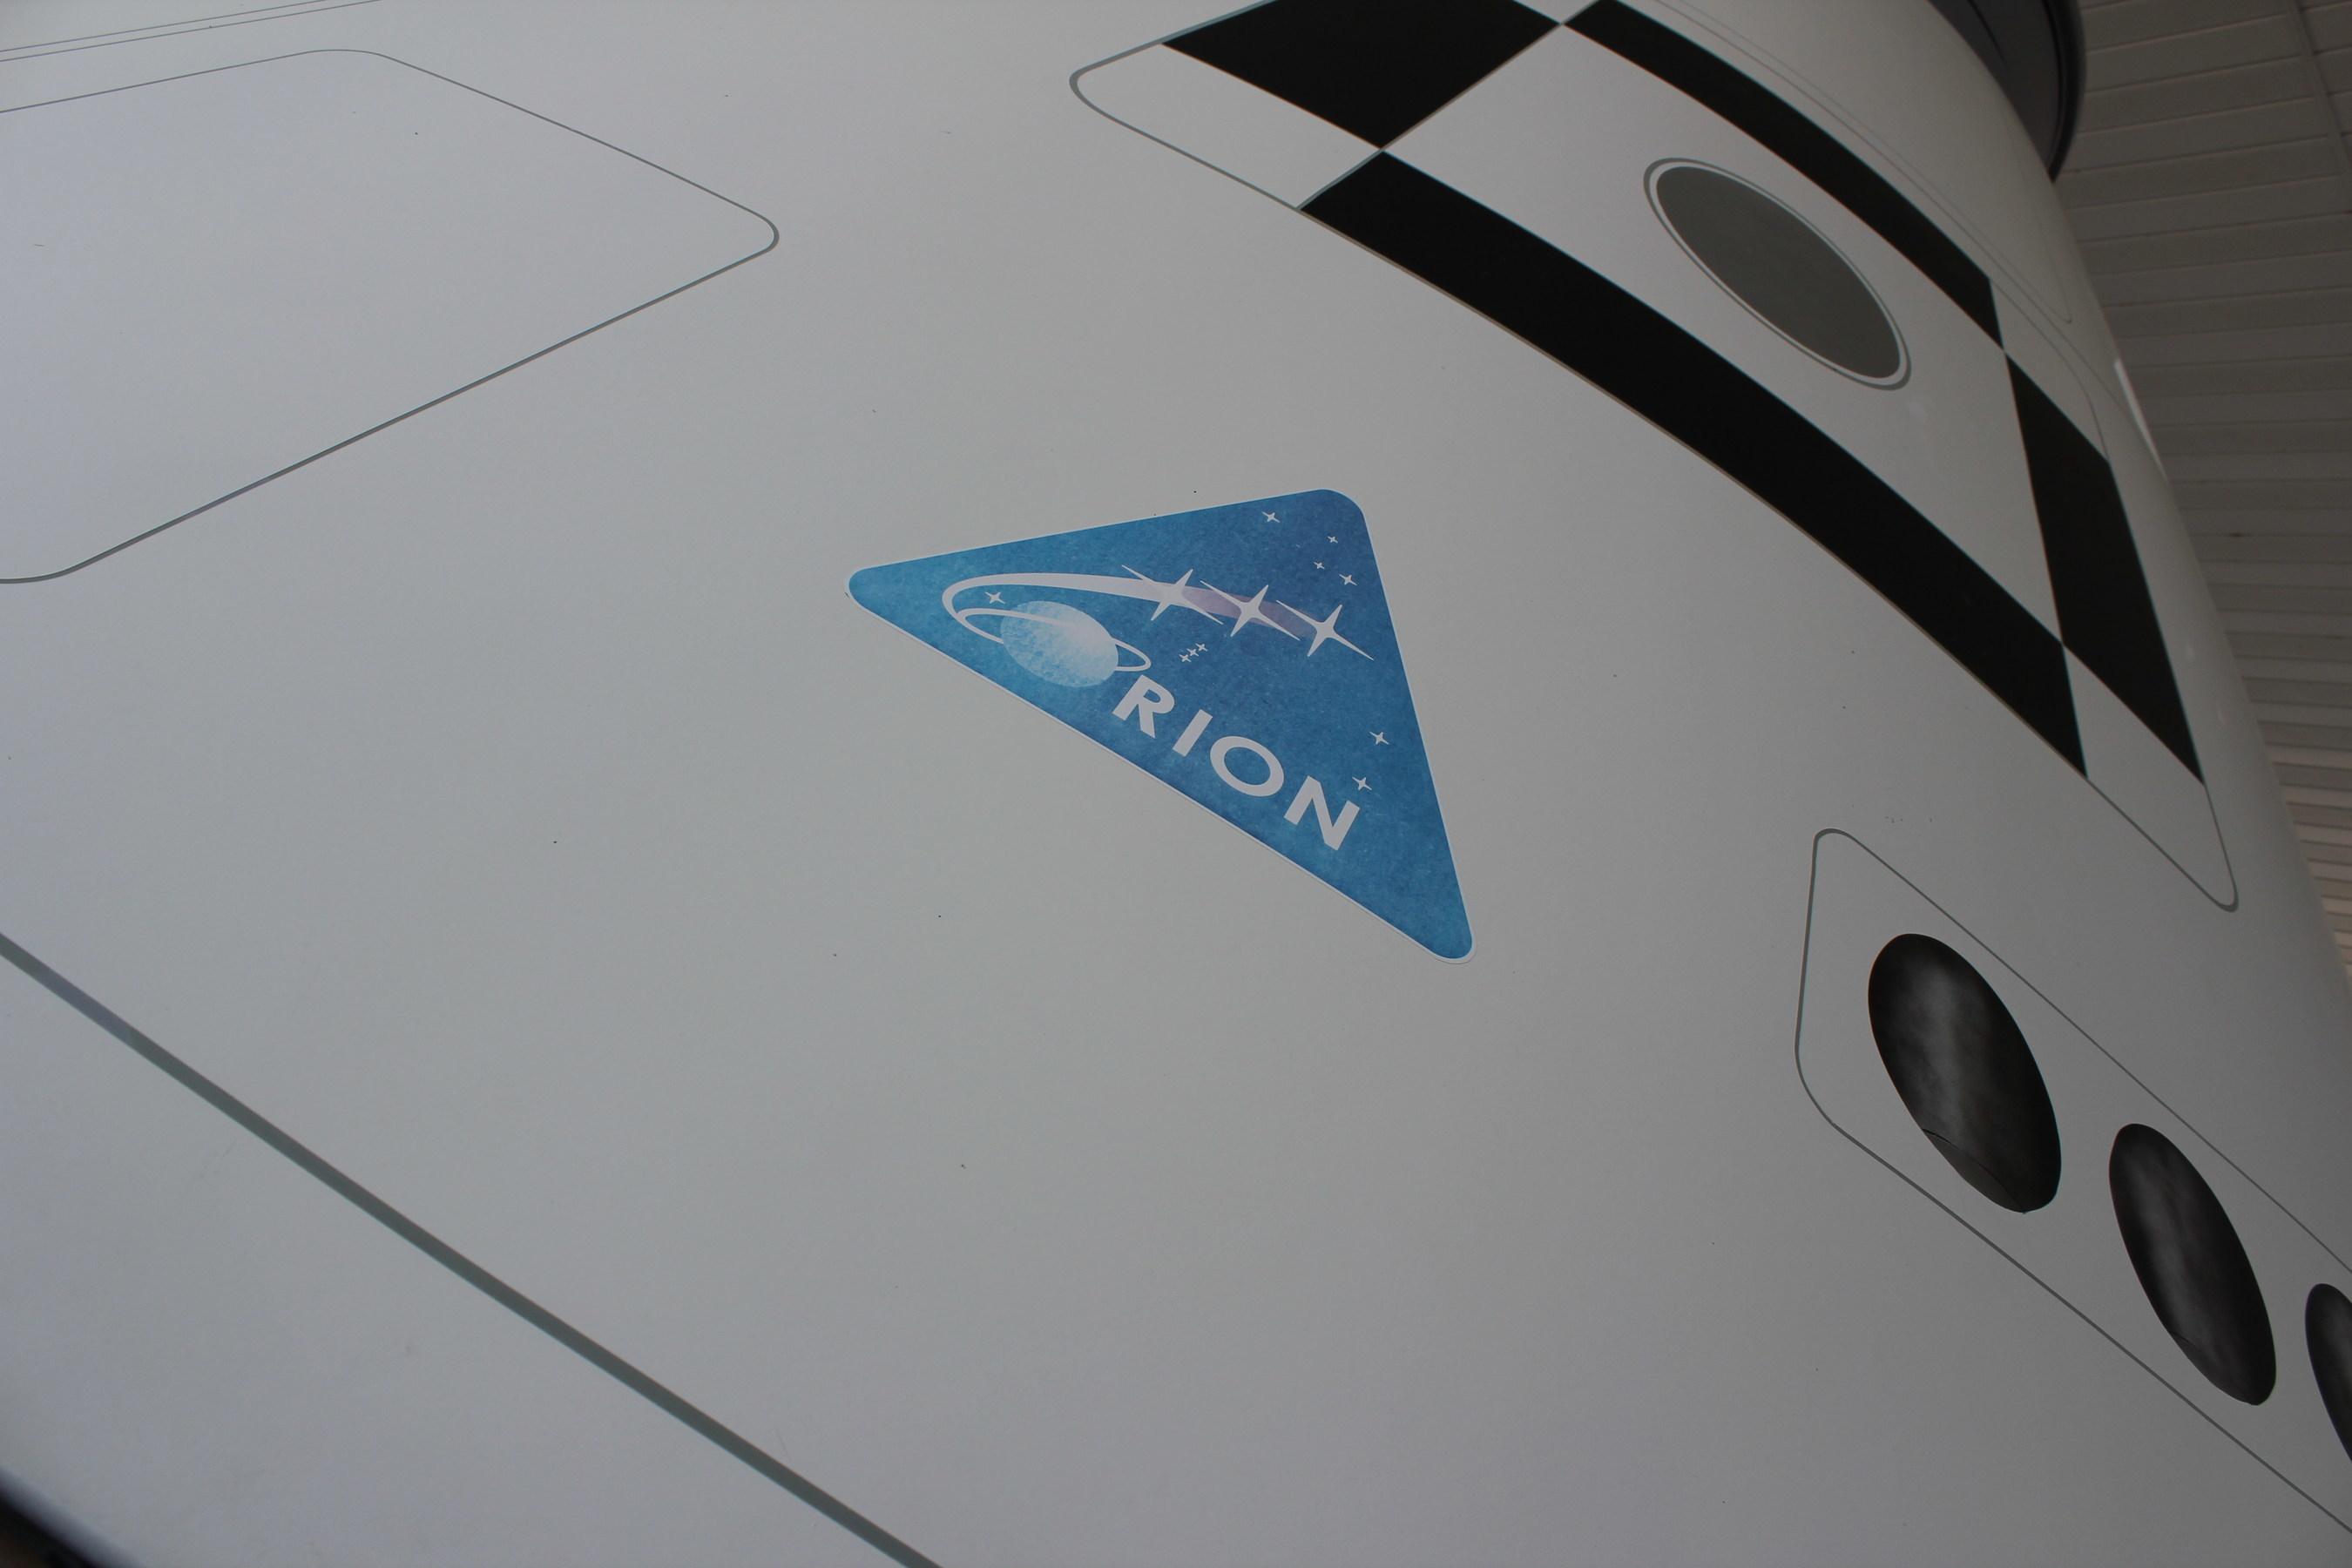 Logo on NASA Orion Spacecraft